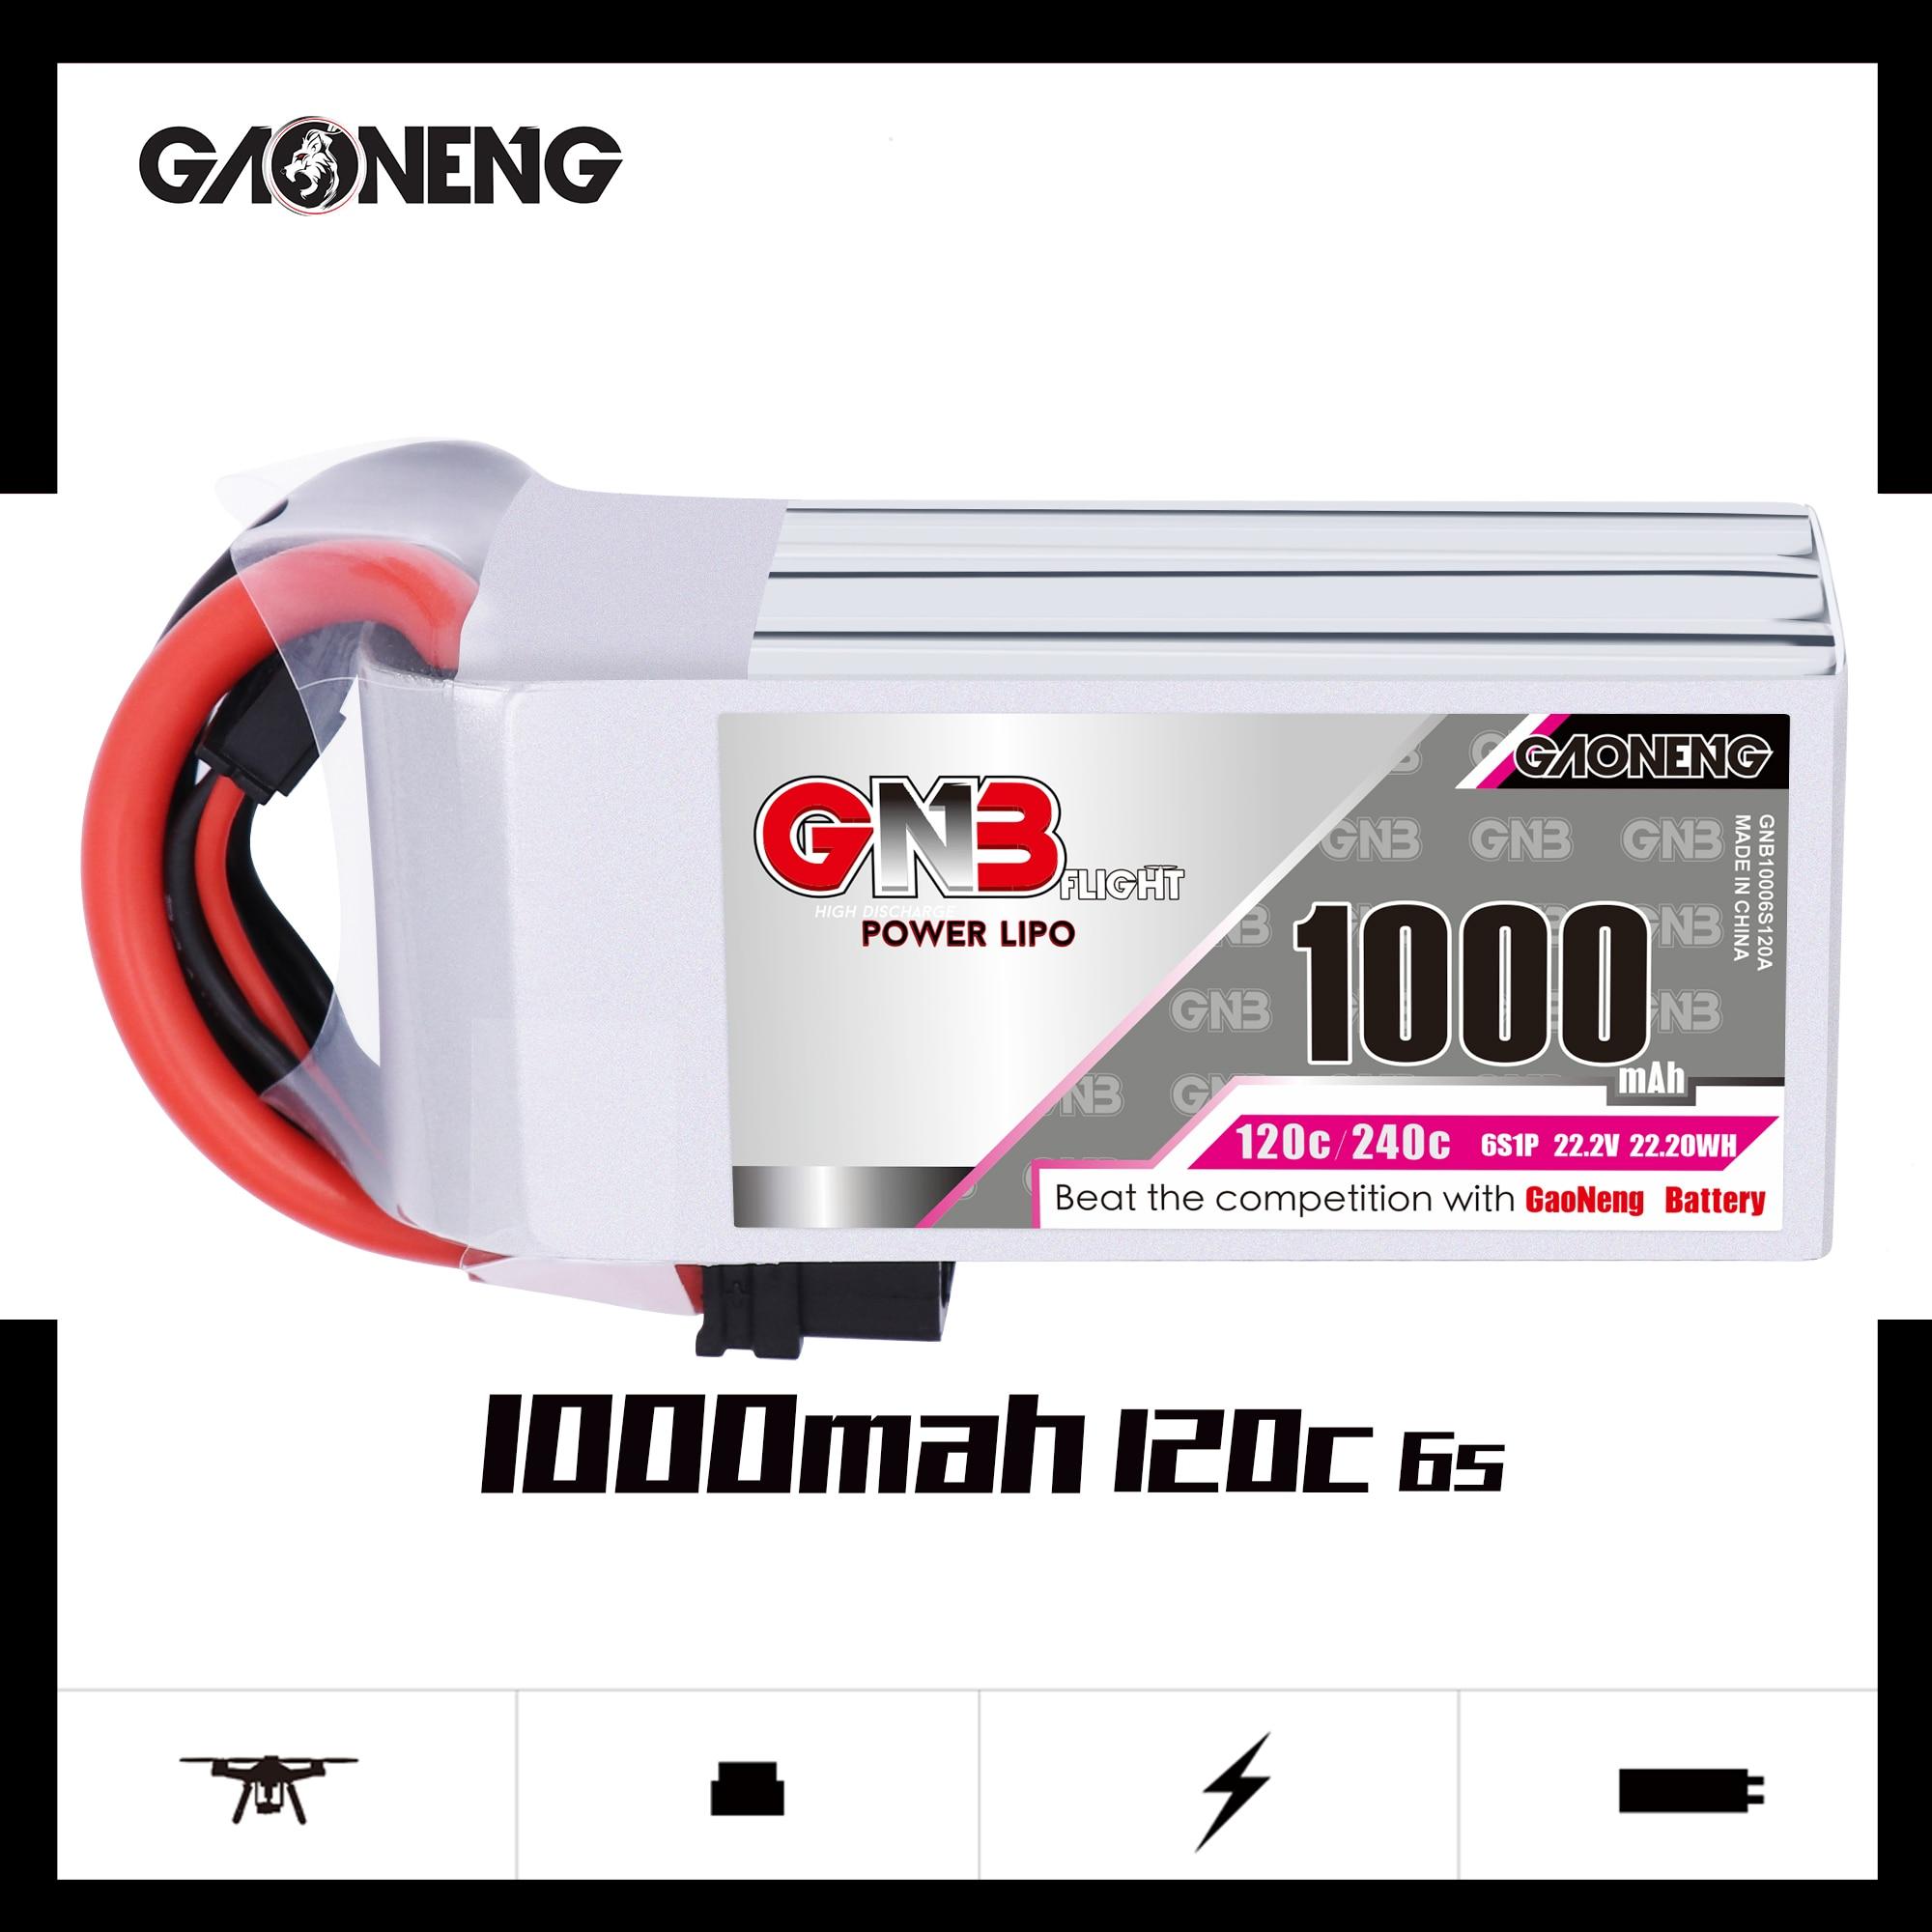 Gaonfeng GNB 1000mAh 22,2 V 6S 120C/240C Lipo batería con XT30 o XT60 enchufe para FPV Racing Drone RC Quadcopter partes de helicóptero